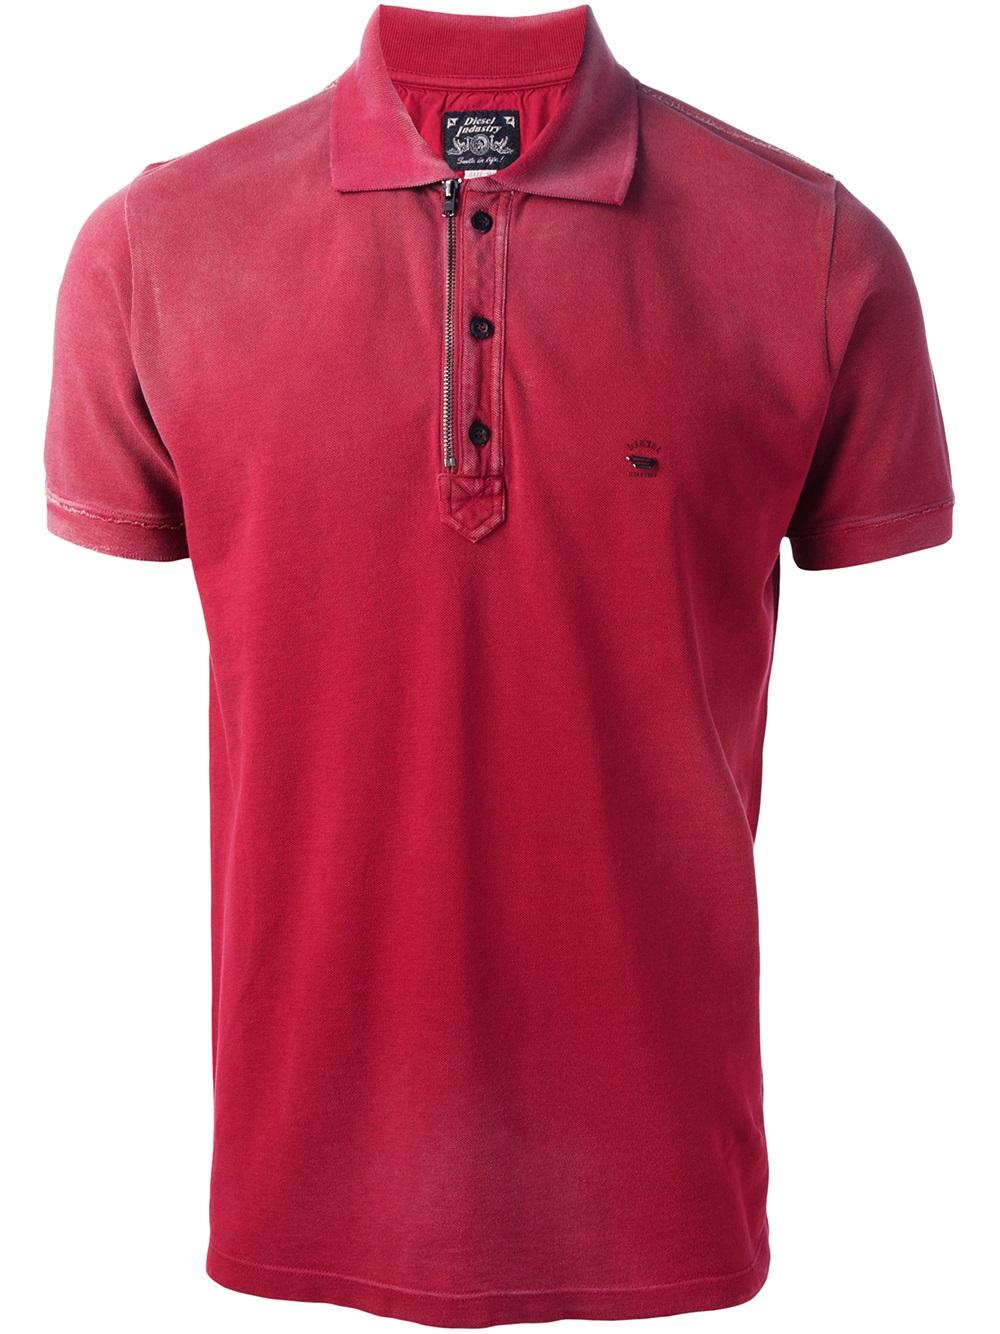 diesel tkalanit polo shirt in red for men lyst. Black Bedroom Furniture Sets. Home Design Ideas